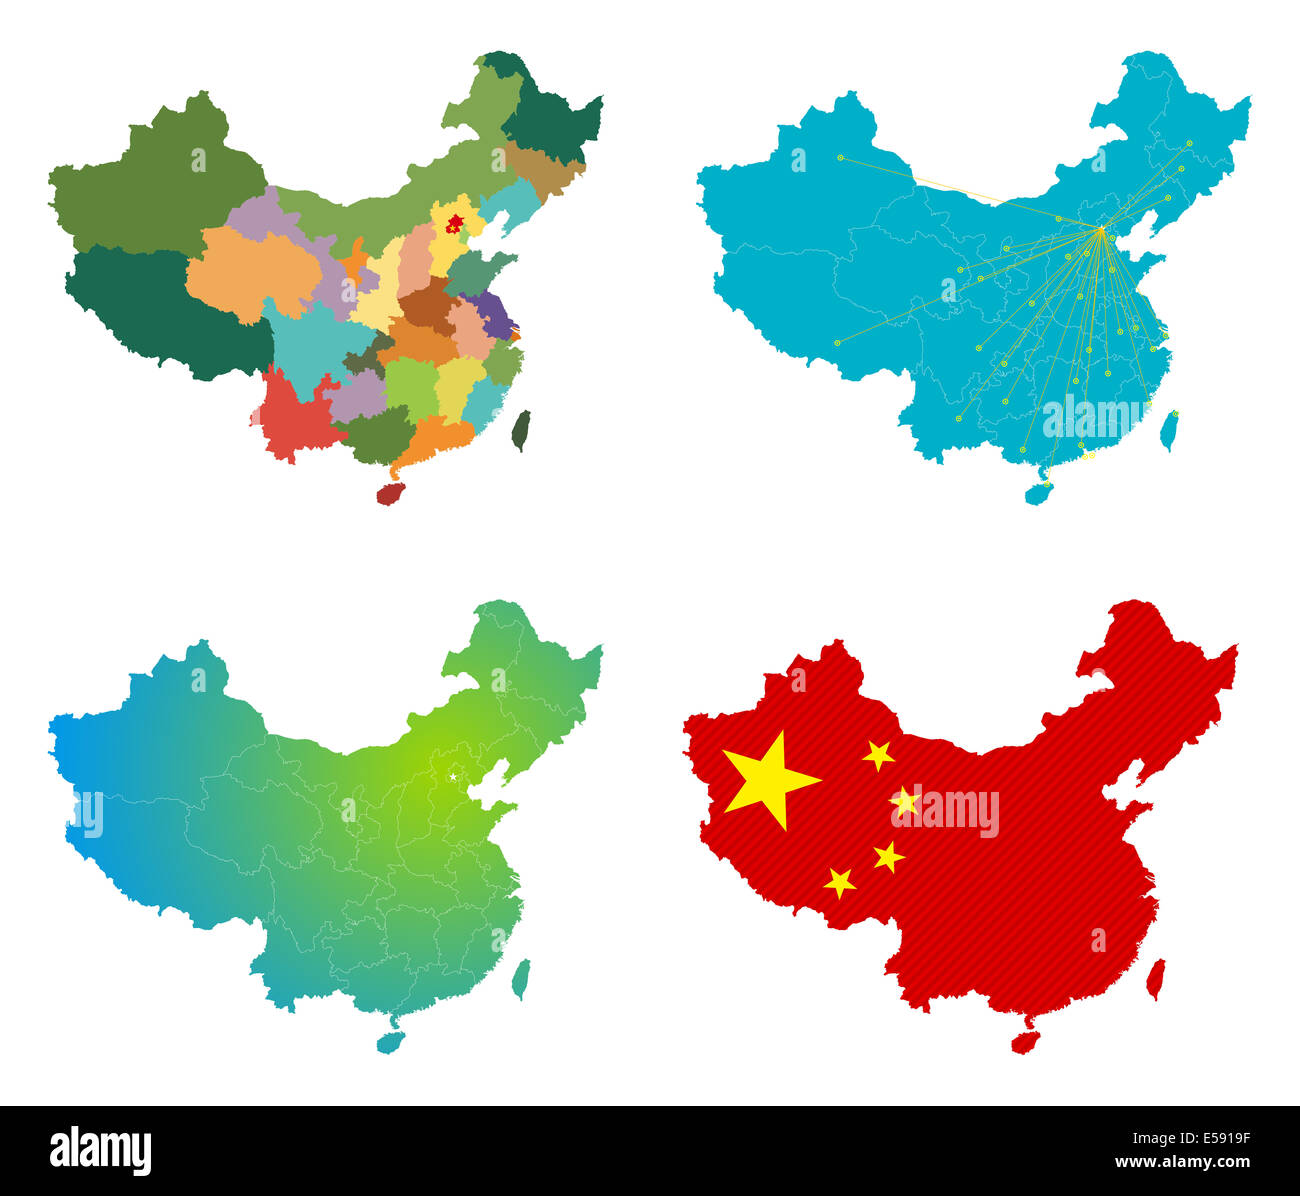 China map set - Stock Image